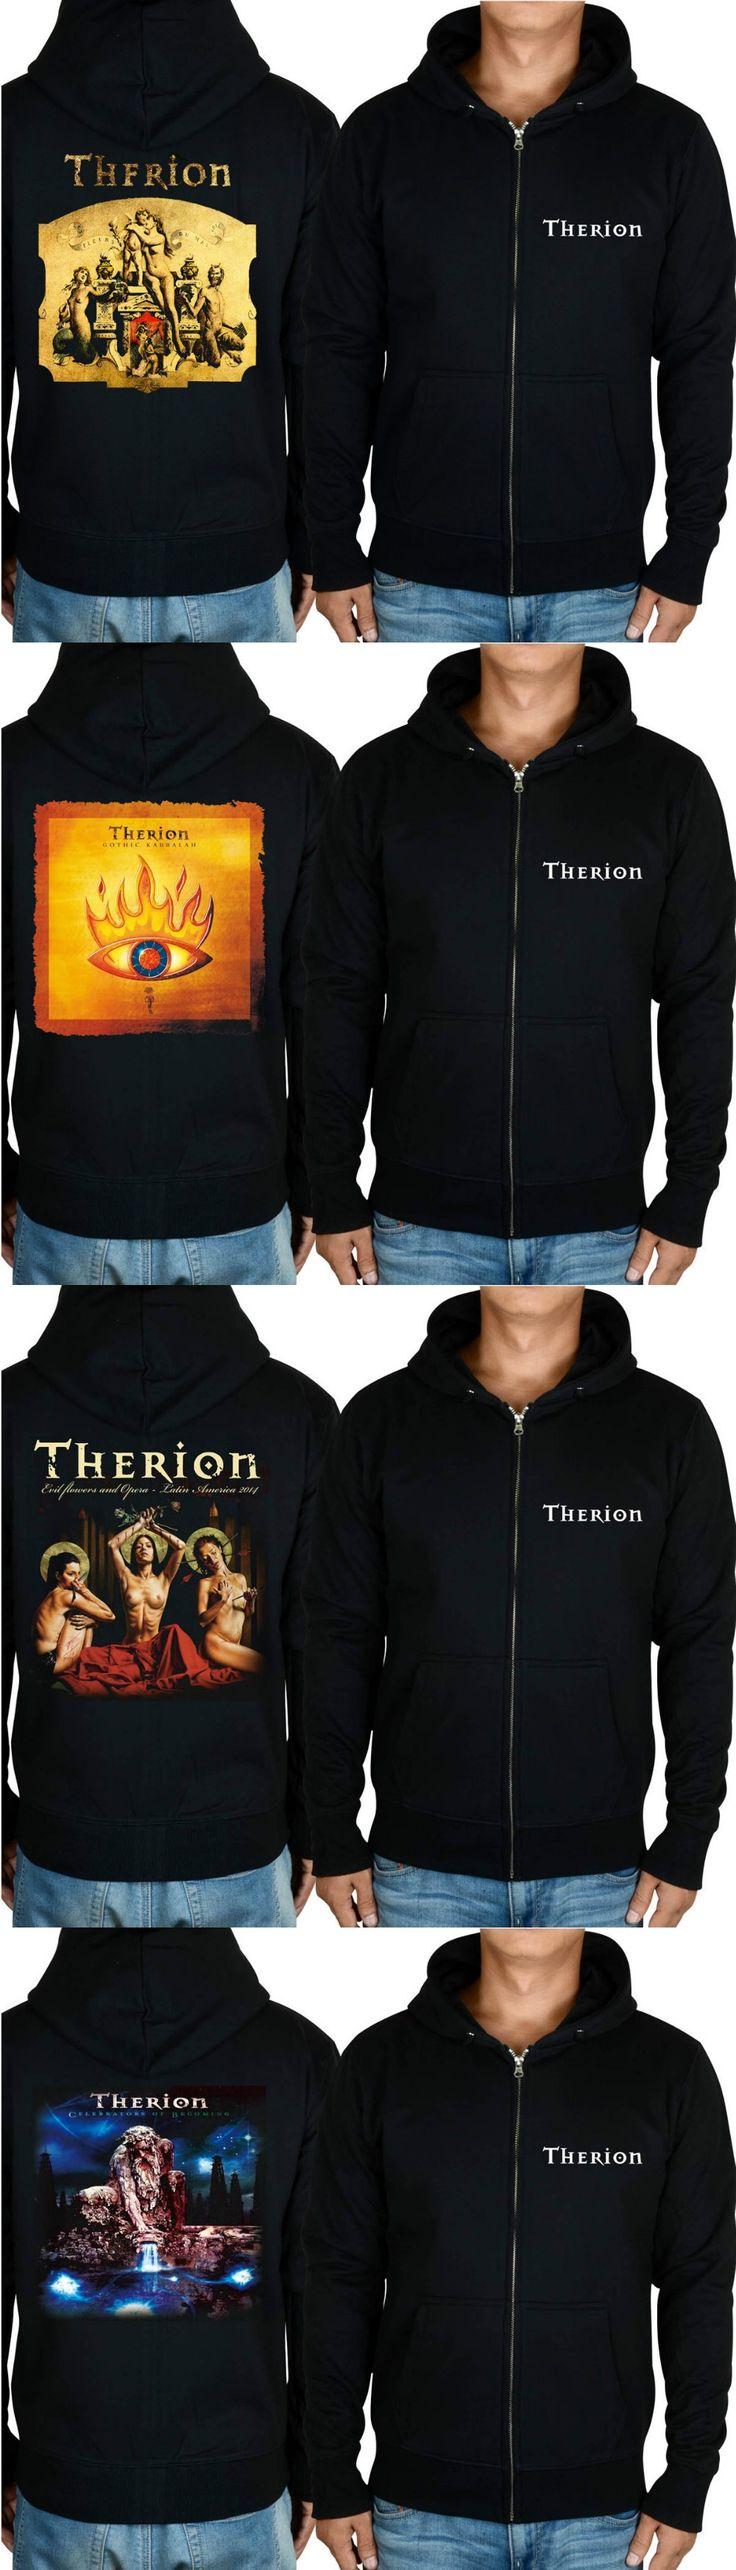 Therion death metal Gothic Kabbalah ablum  symphonic metal  black new hoodie